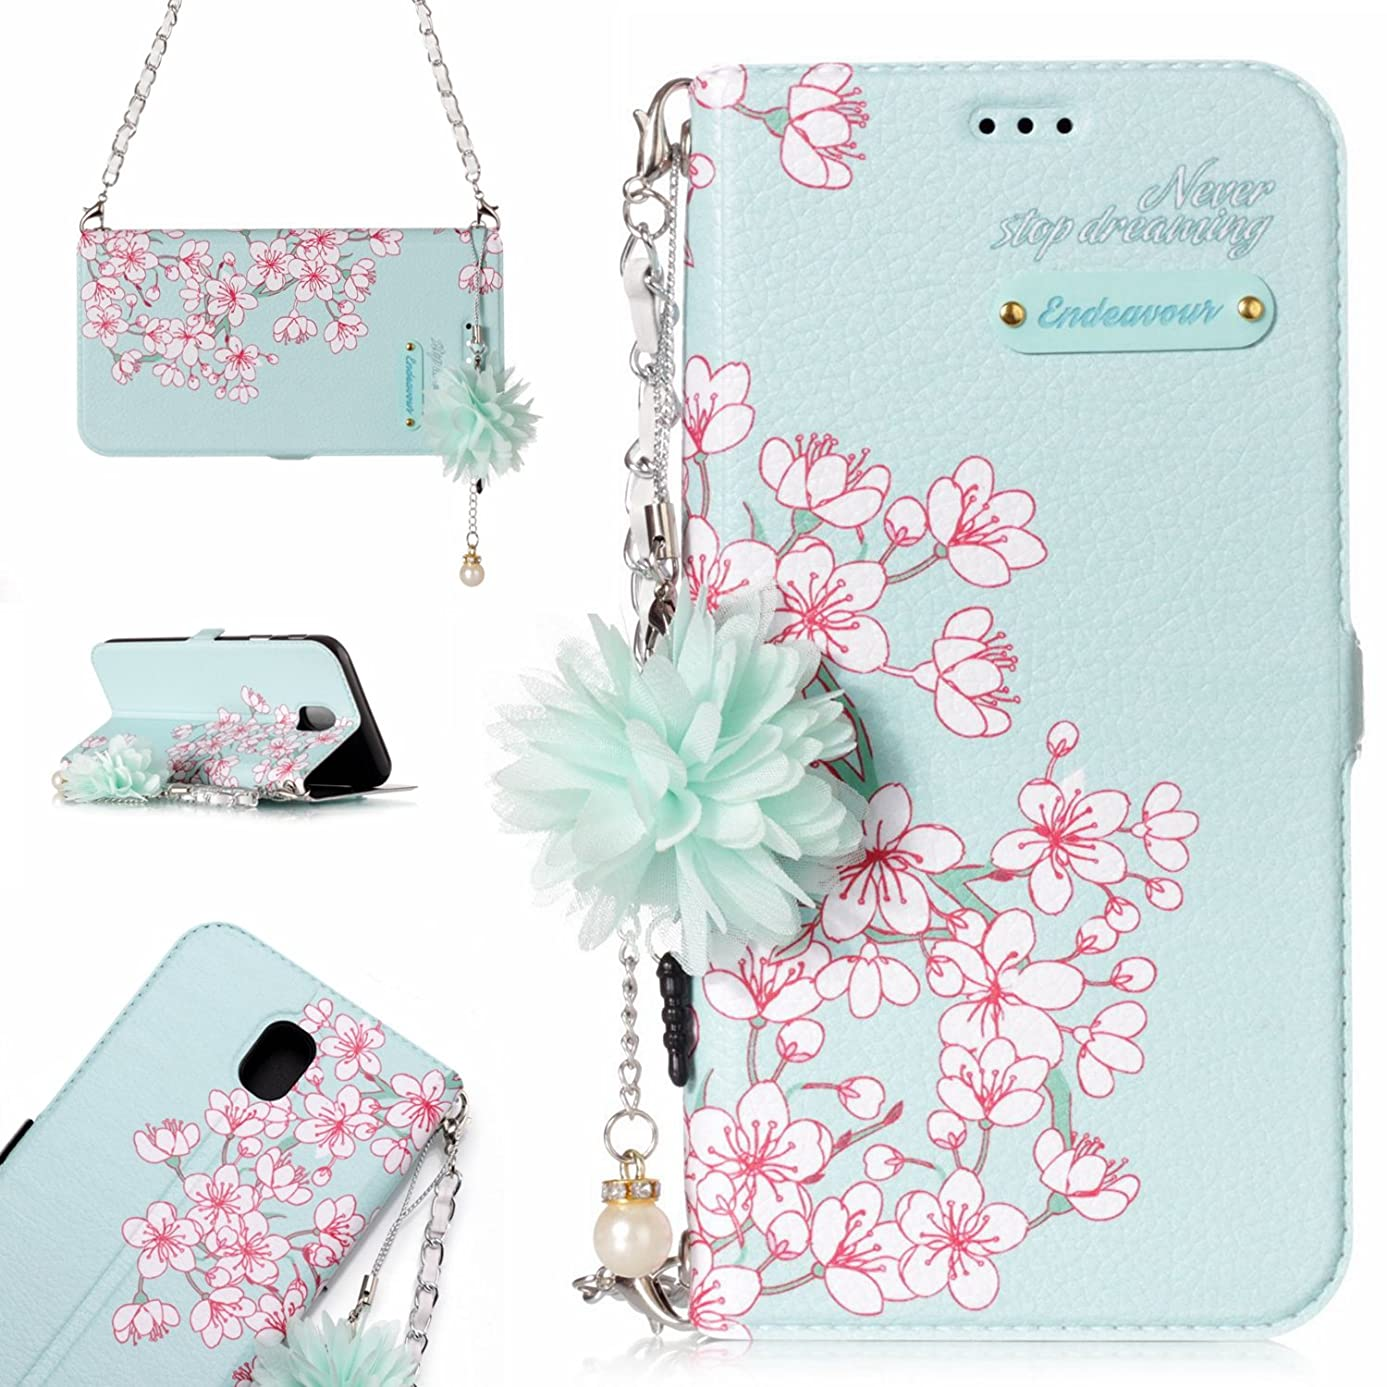 Galaxy J7 2017 Case, Stingna Fashion painting Flower Leather Wallet Cover case Women Handbag Flip Card Holder with Pendant Metal Chain for Samsung Galaxy J7 (2017)/J7V 2017/J7 Prime (F)